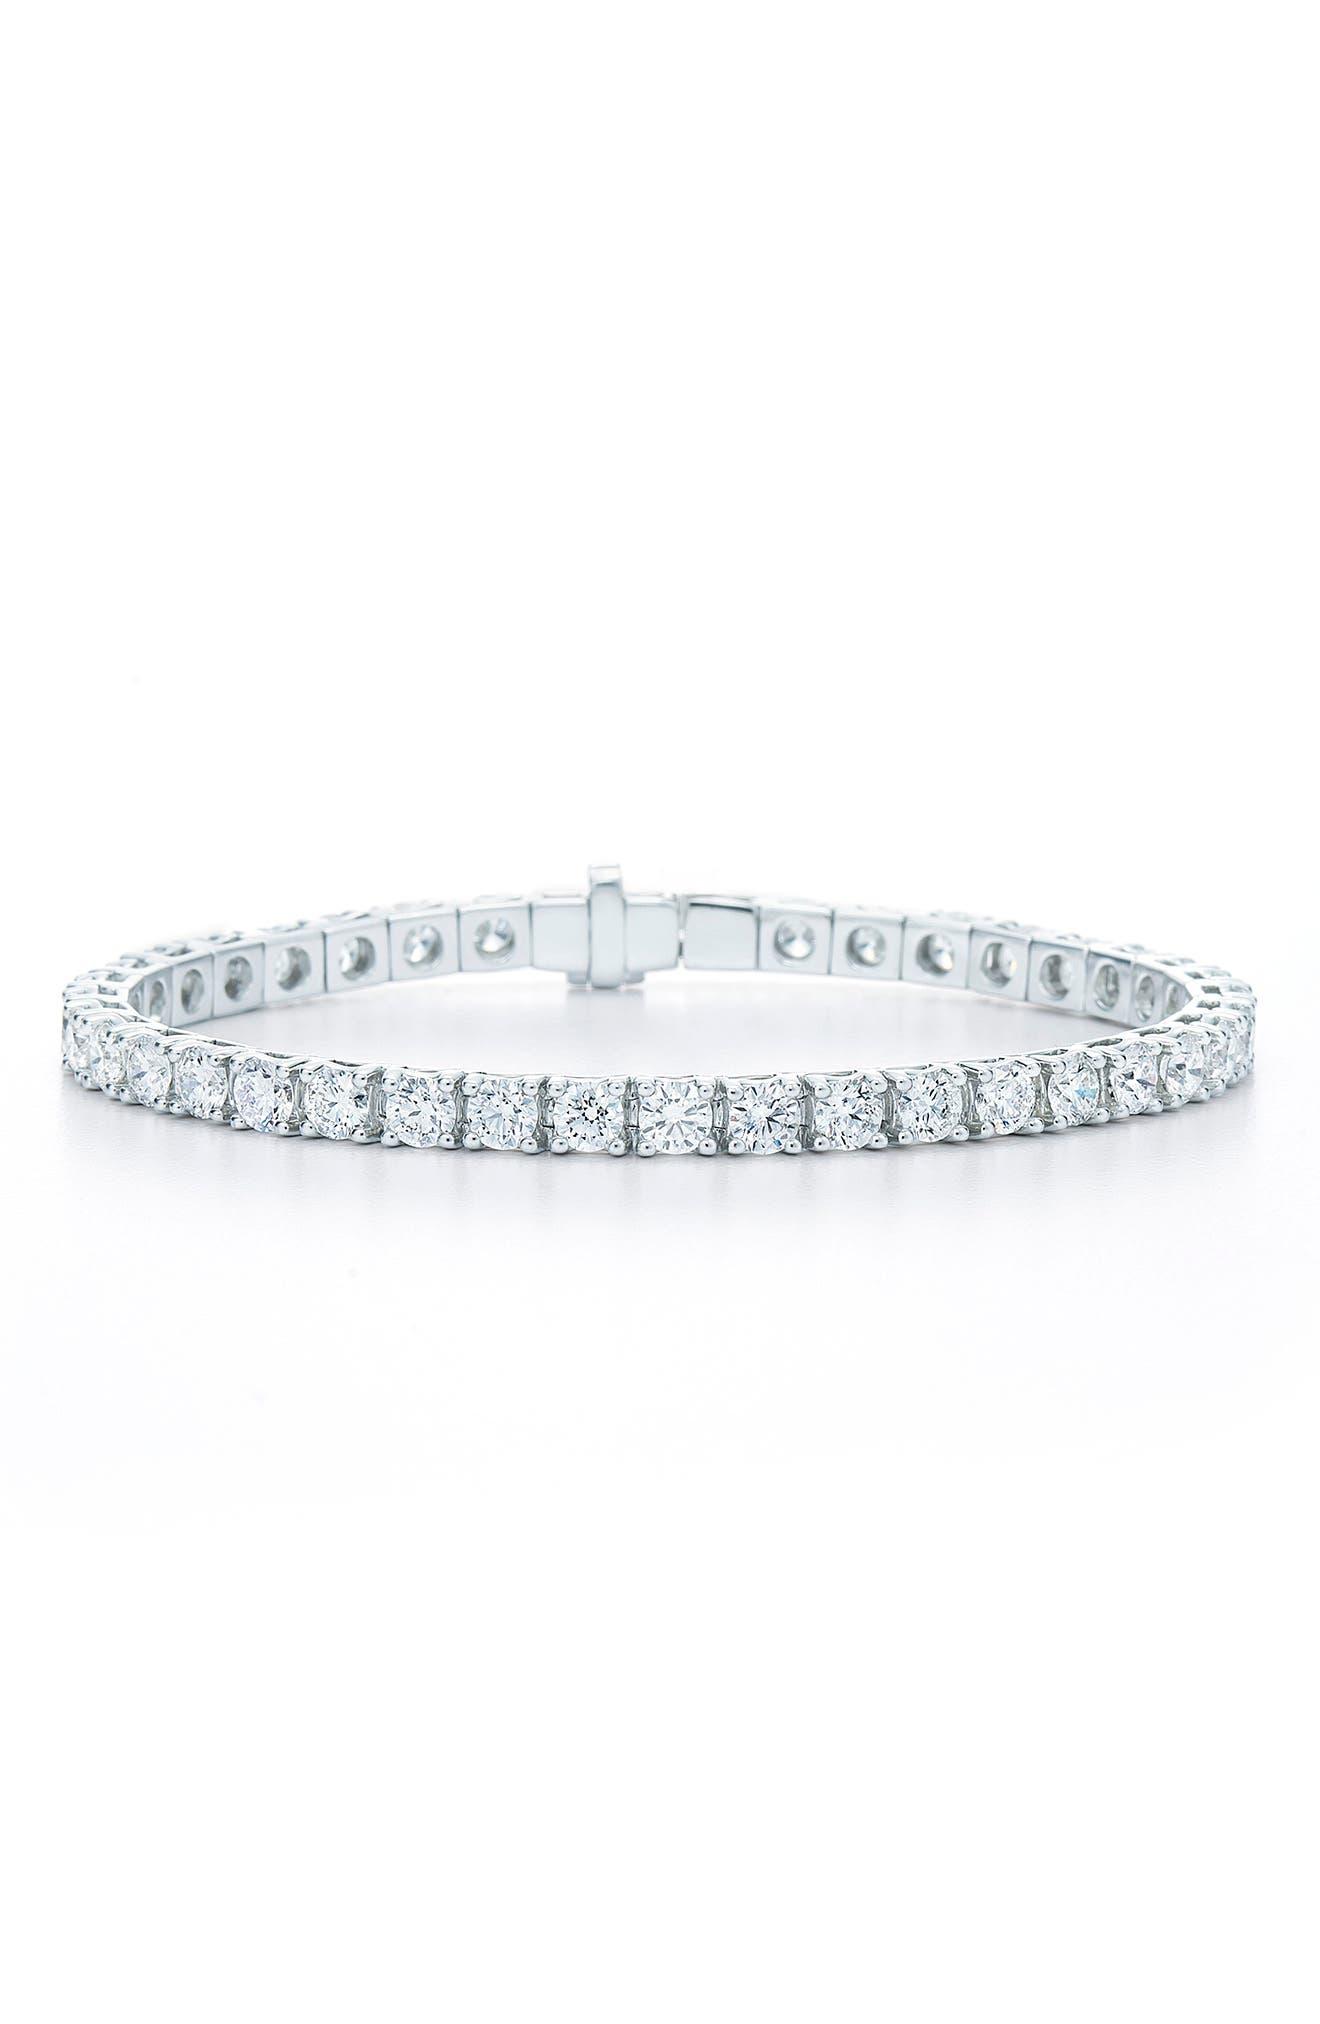 Riviera Diamond Line Bracelet,                         Main,                         color, WHITE GOLD